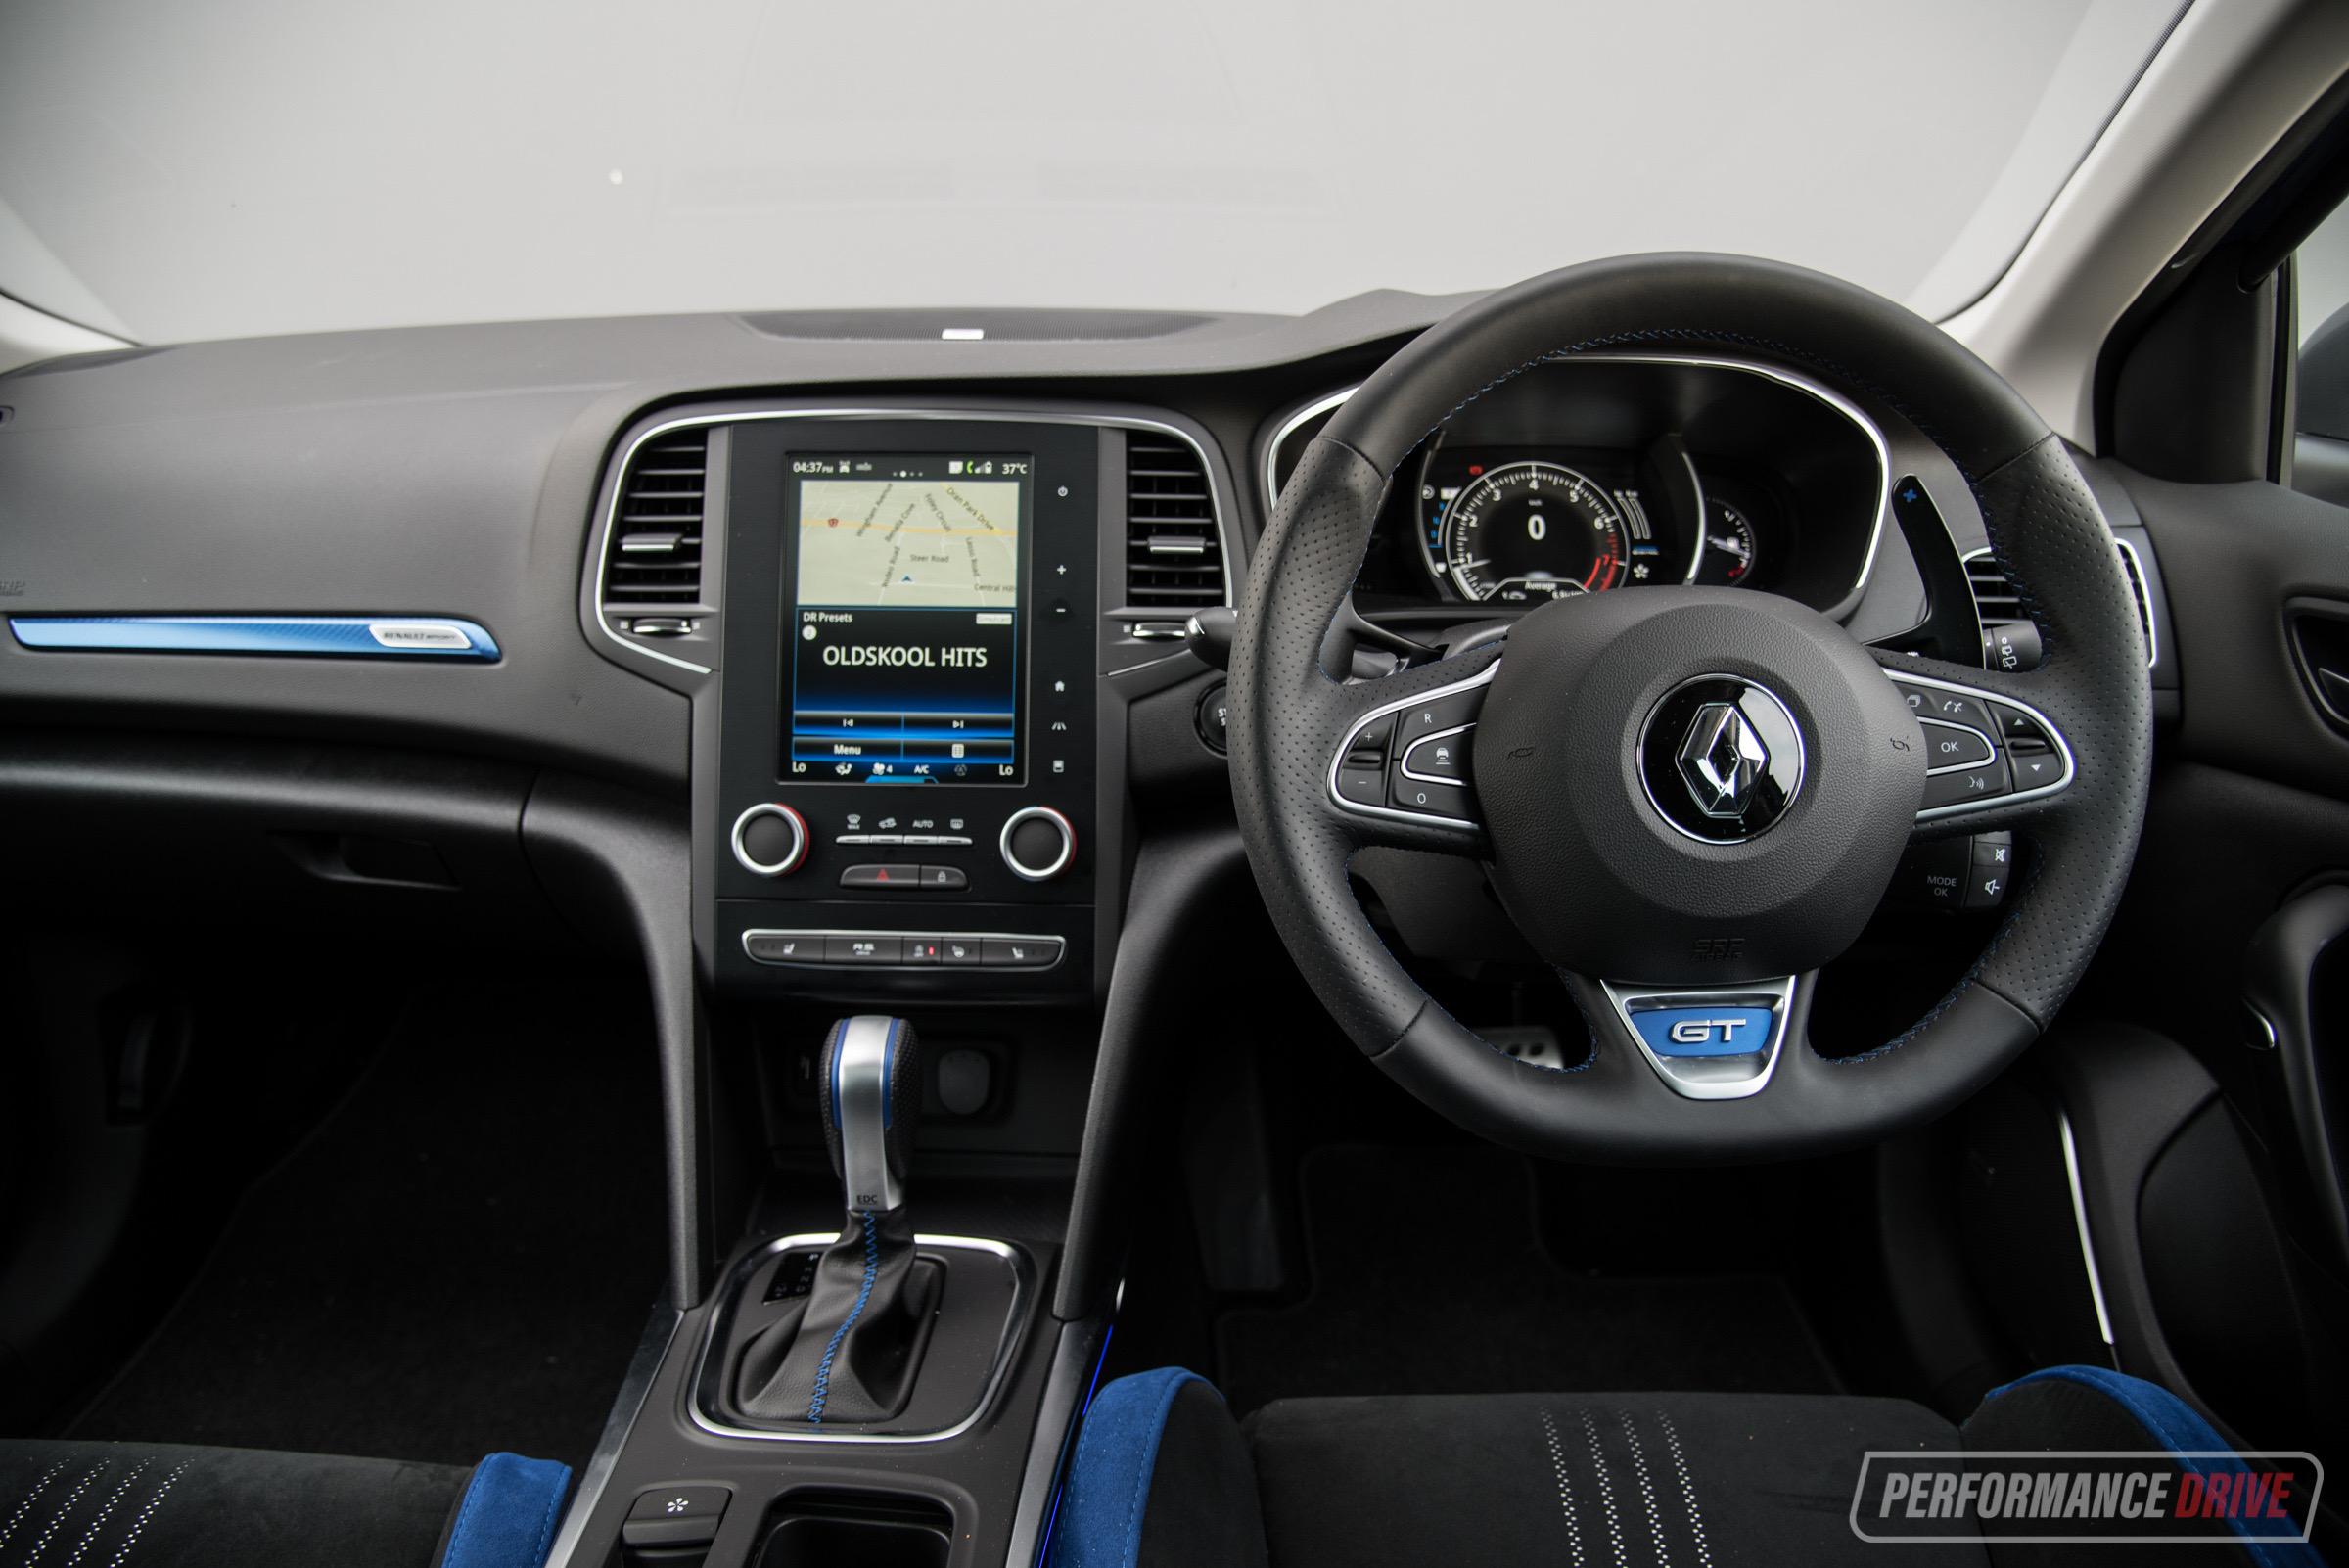 2017 Renault Megane GT wagon review (video) | PerformanceDrive